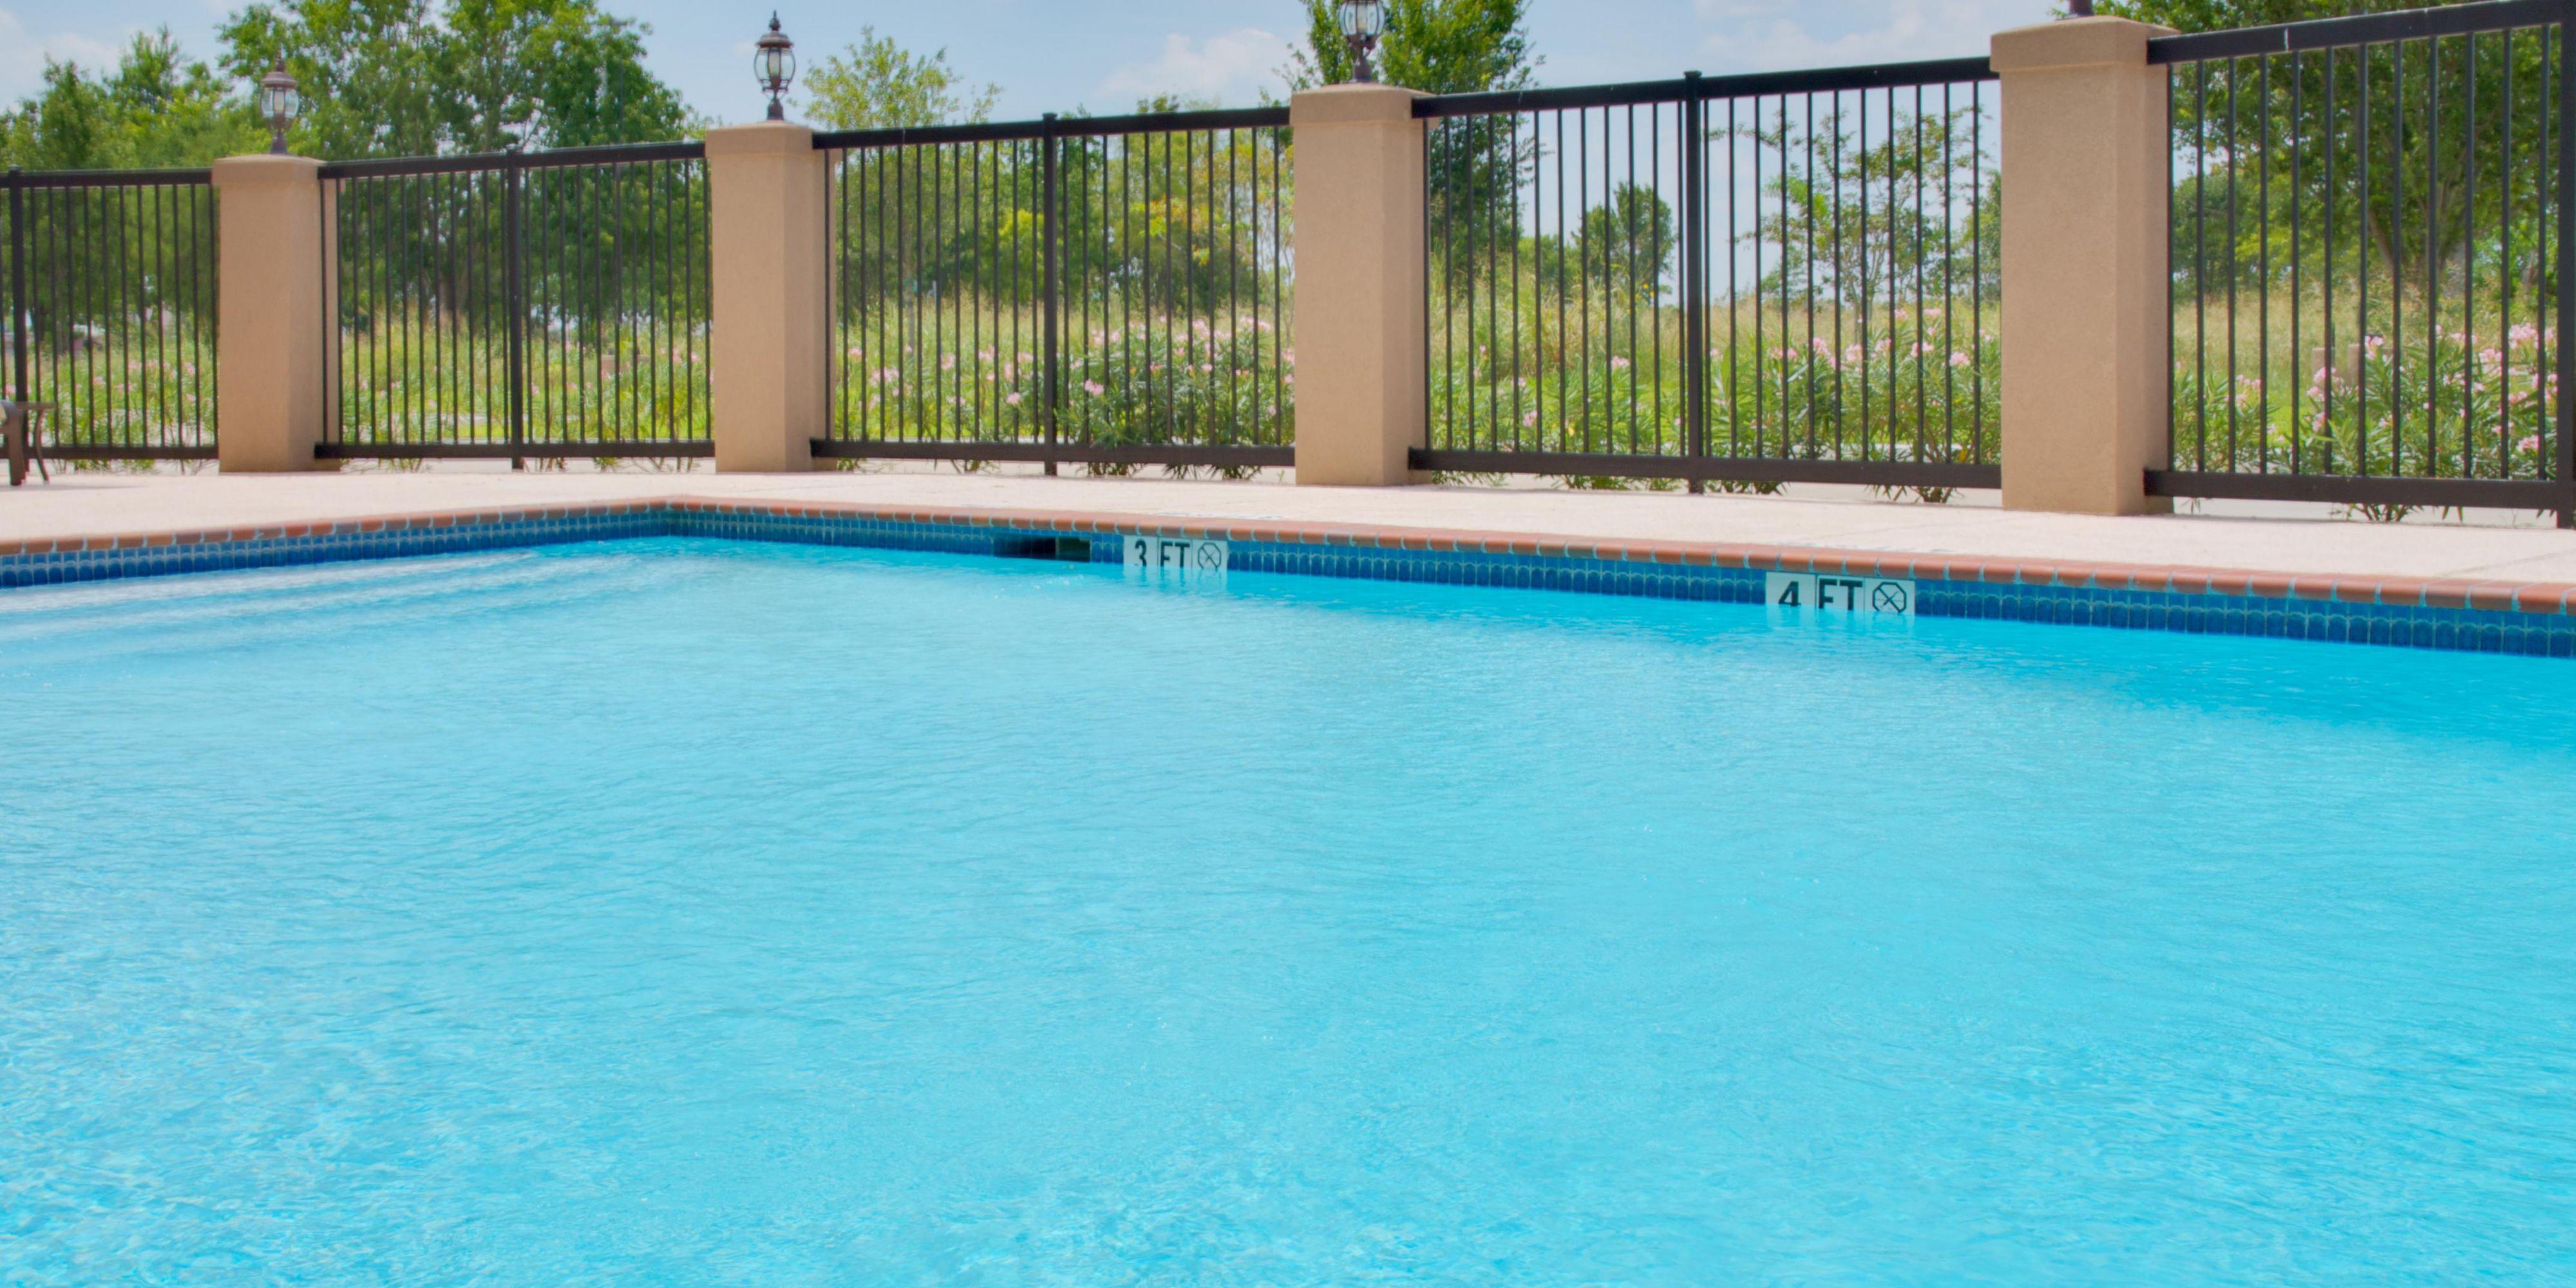 Holiday Inn Express & Suites Houston Energy Corridor-W Oaks Hotel by IHG